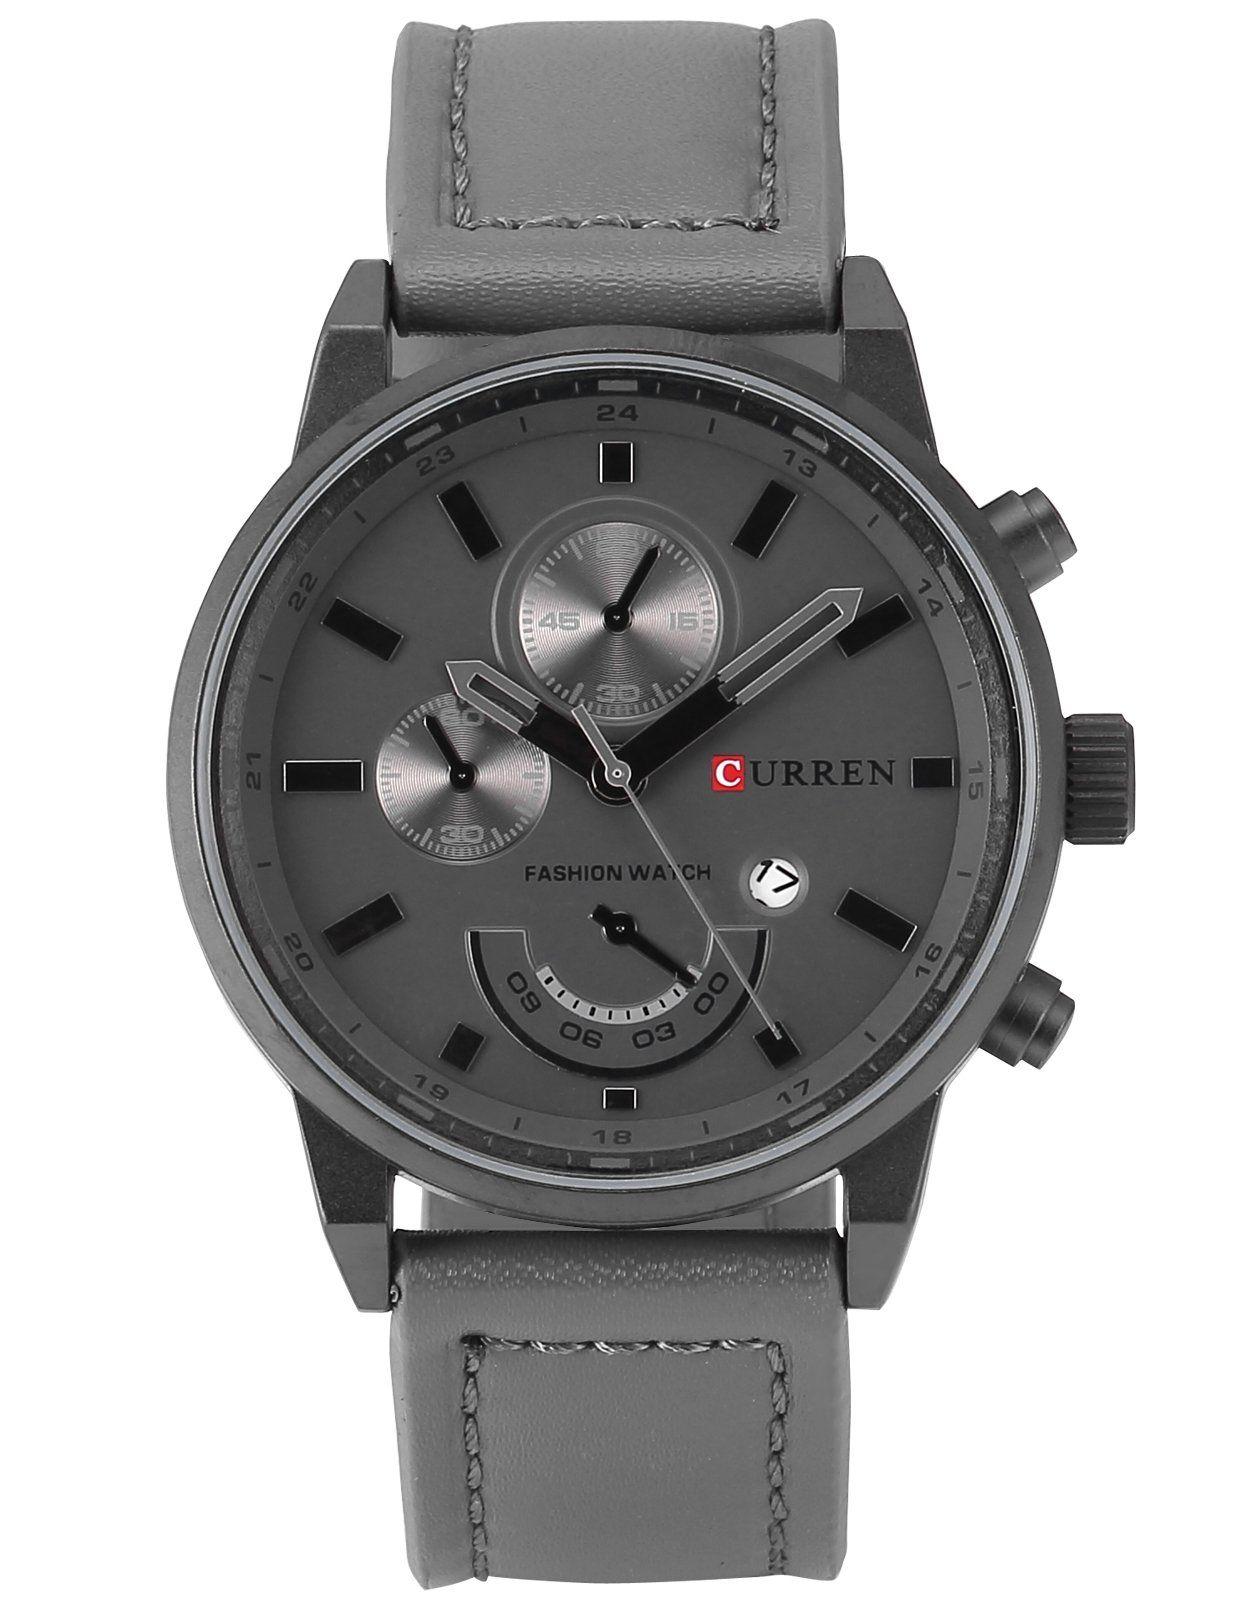 AMPM24 CUR118 Mens Quartz Wrist Watch Dress Leather Grey